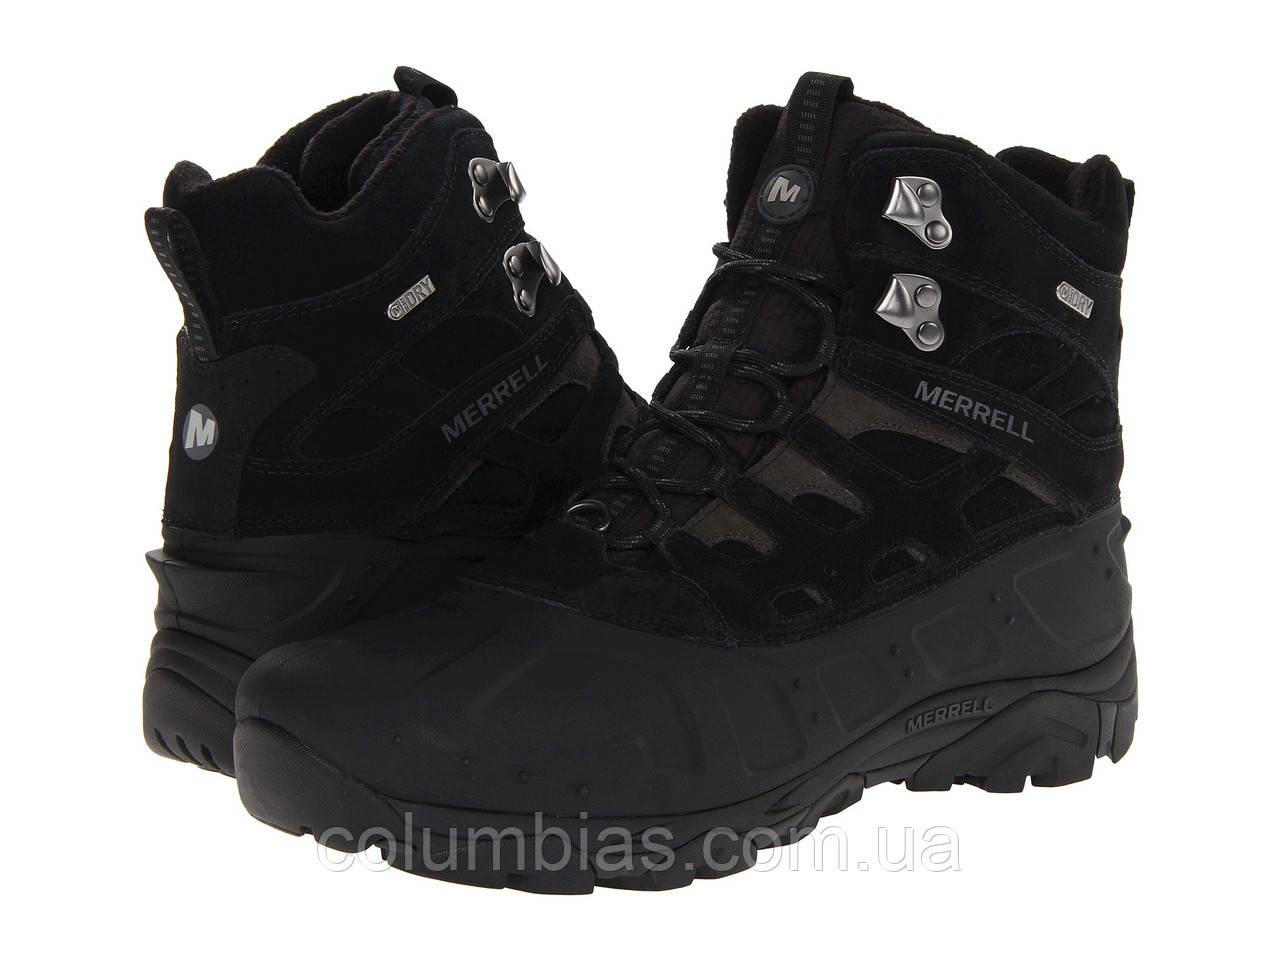 Зимние ботинки Merrell Moab Polar Waterproof - ВЕСЬ ТОВАР В НАЛИЧИИ.  ЗВОНИТЕ В ЛЮБОЕ ВРЕМЯ 4f7d4feed90